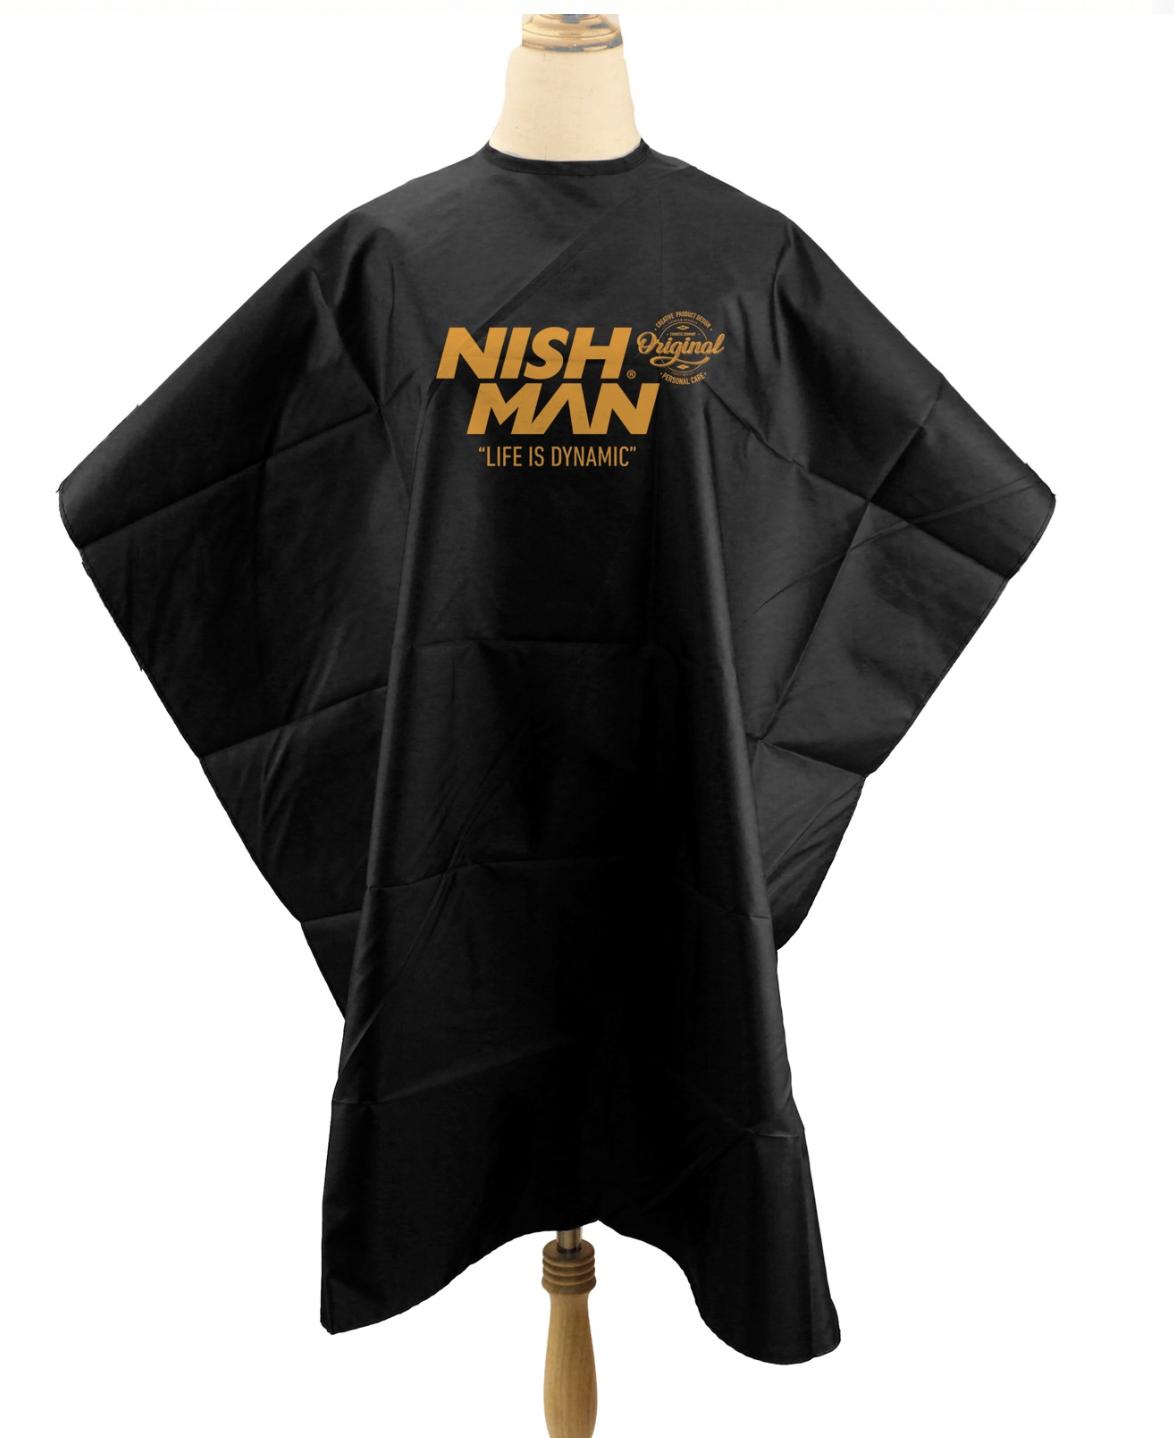 Nishman Barber Cape 02 - čierna barber pláštenka na háčik